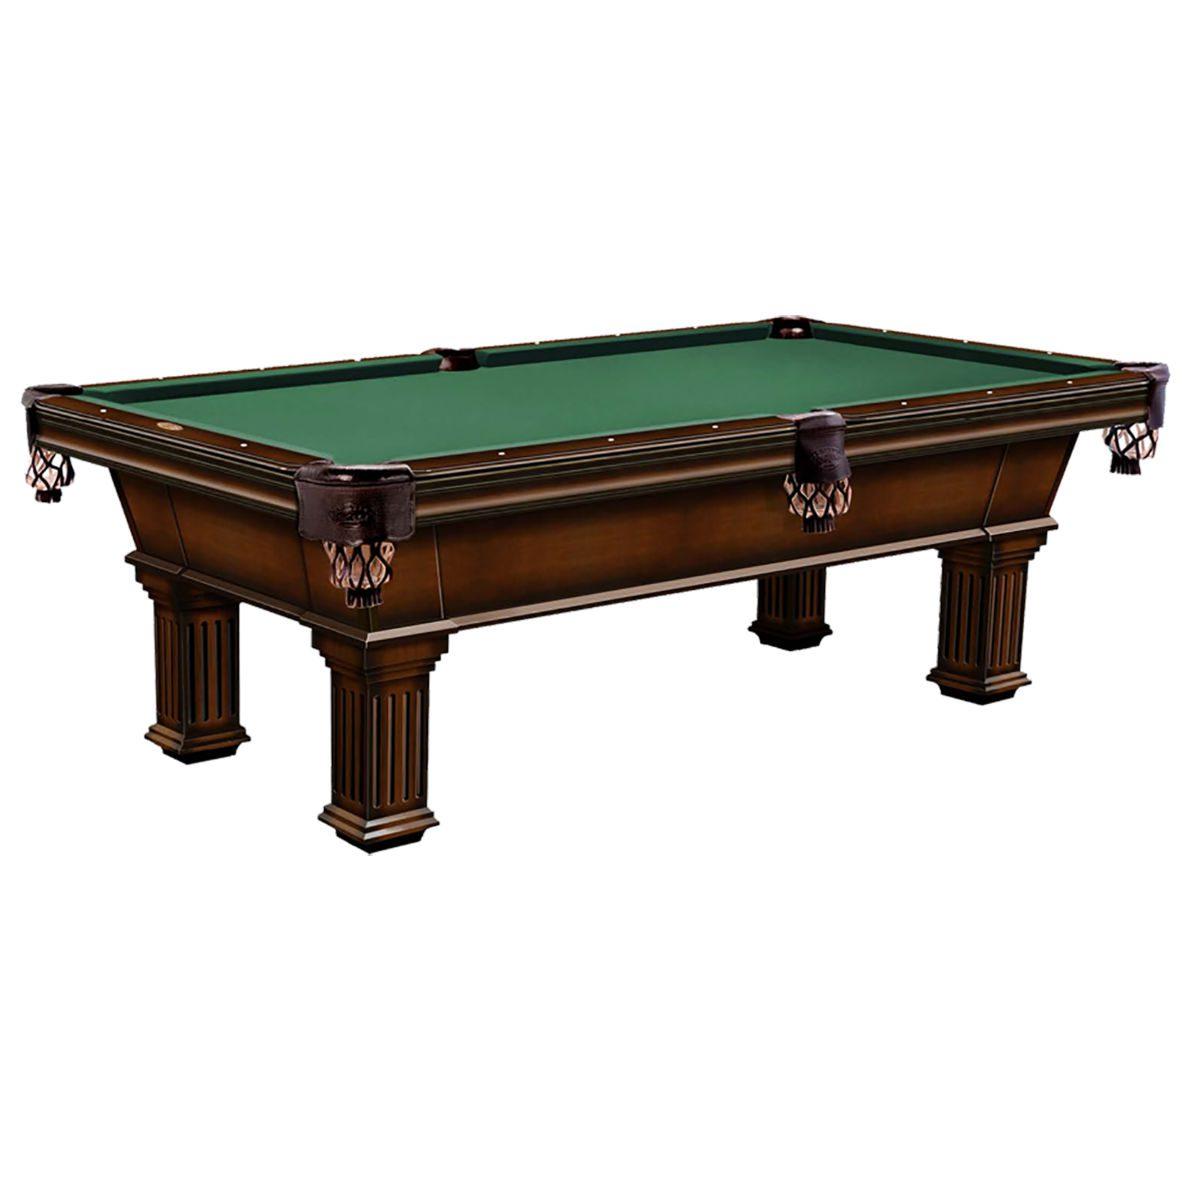 New Nashville Pool Table Olhausen Montgomeryville PA - Blackhawk pool table